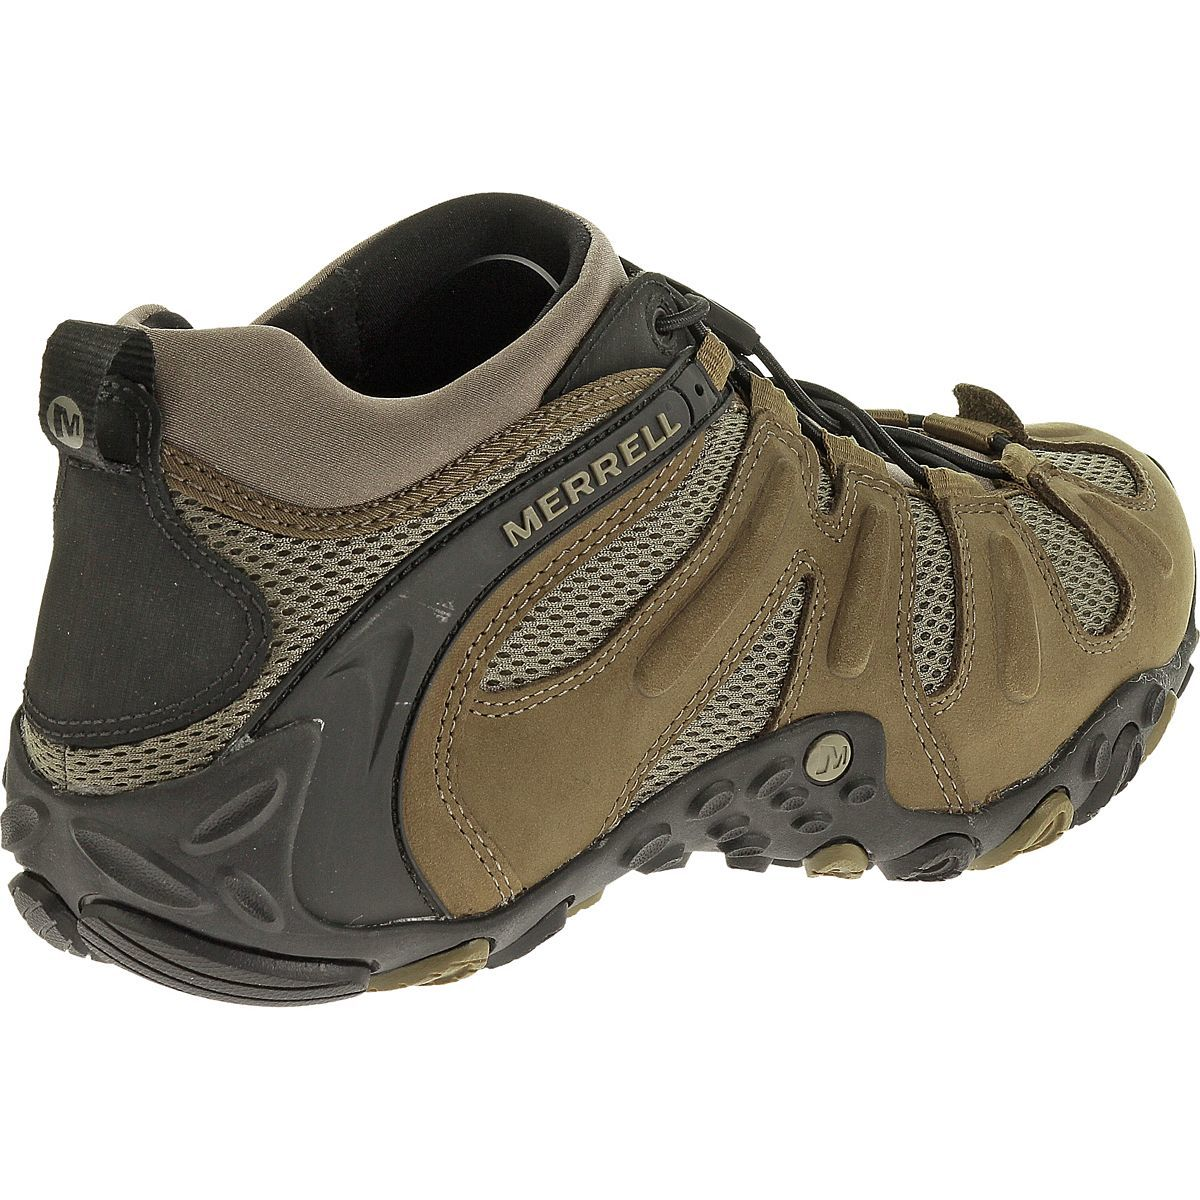 Chameleon Prime Stretch Hiking Shoes